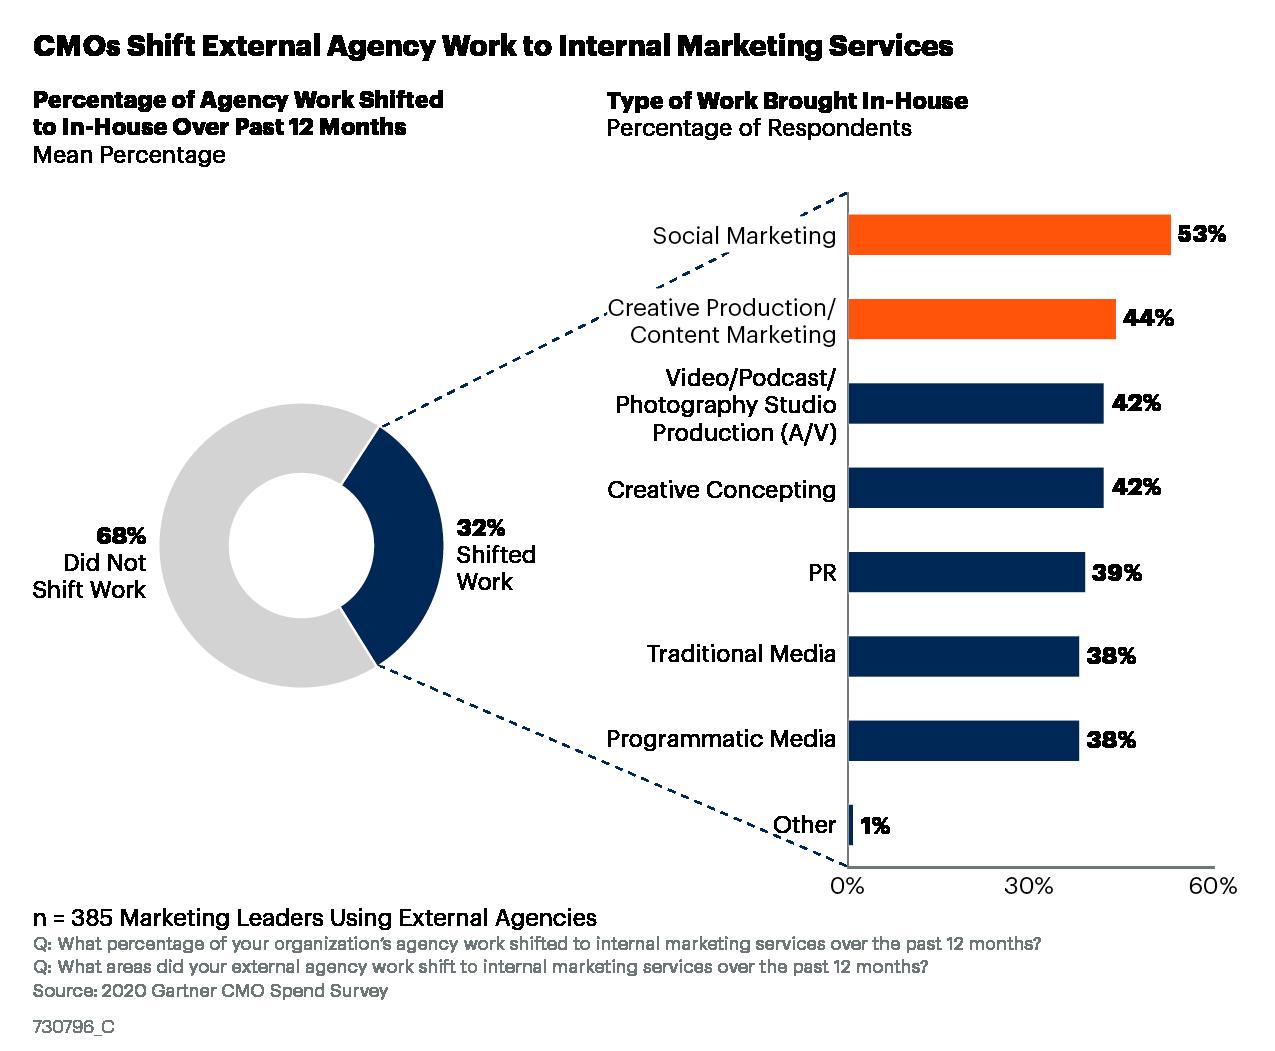 CMOs Shift External Agency Work to In-House Agencies, Gartner 2020 CMO Spend Survey